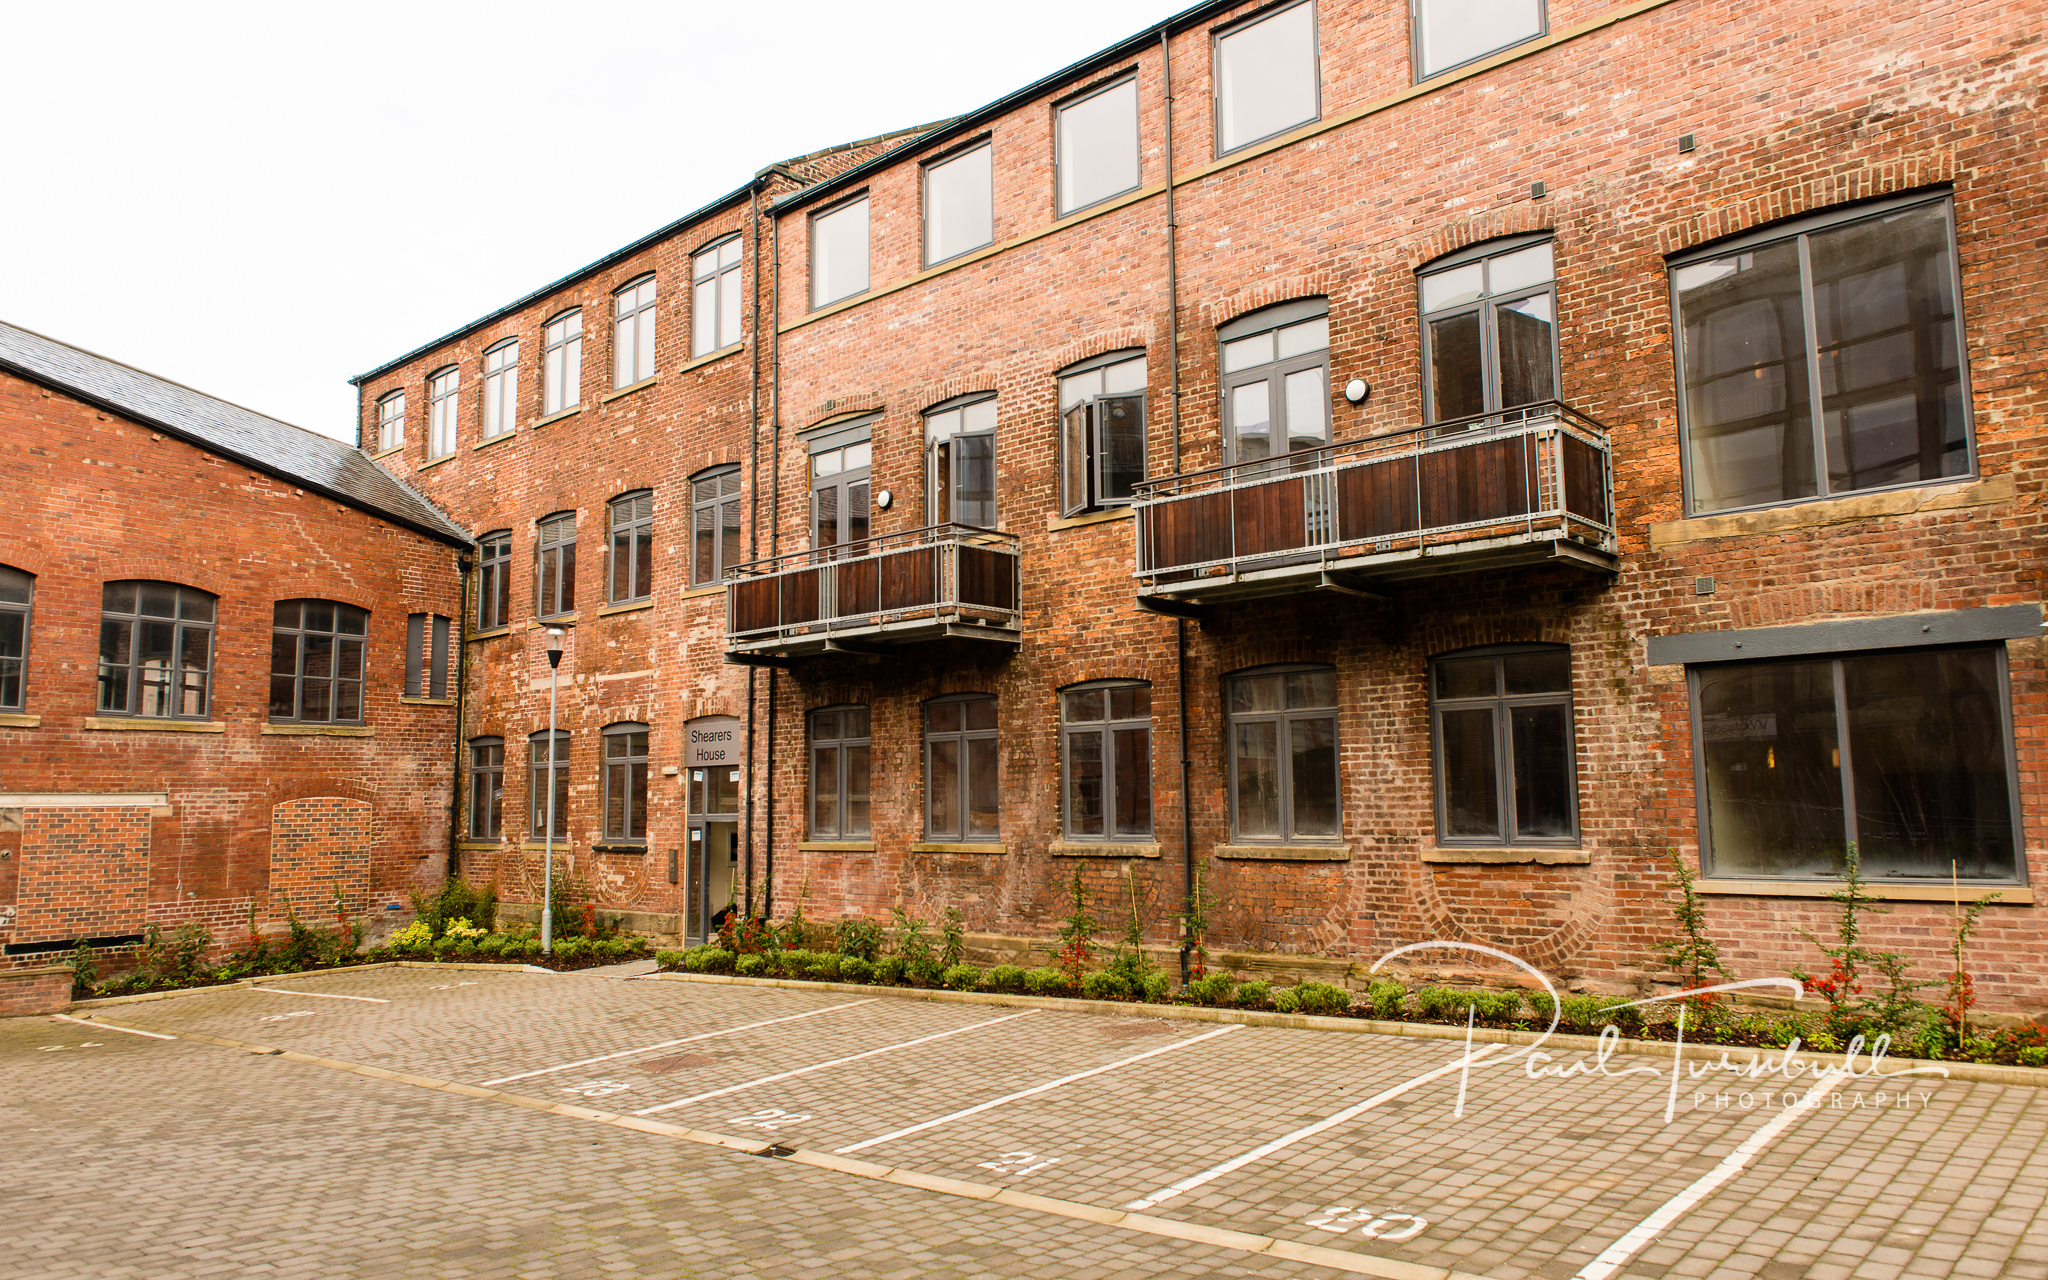 commercial-property-photographer-leeds-yorkshire-blackbrook-developments-009.jpg